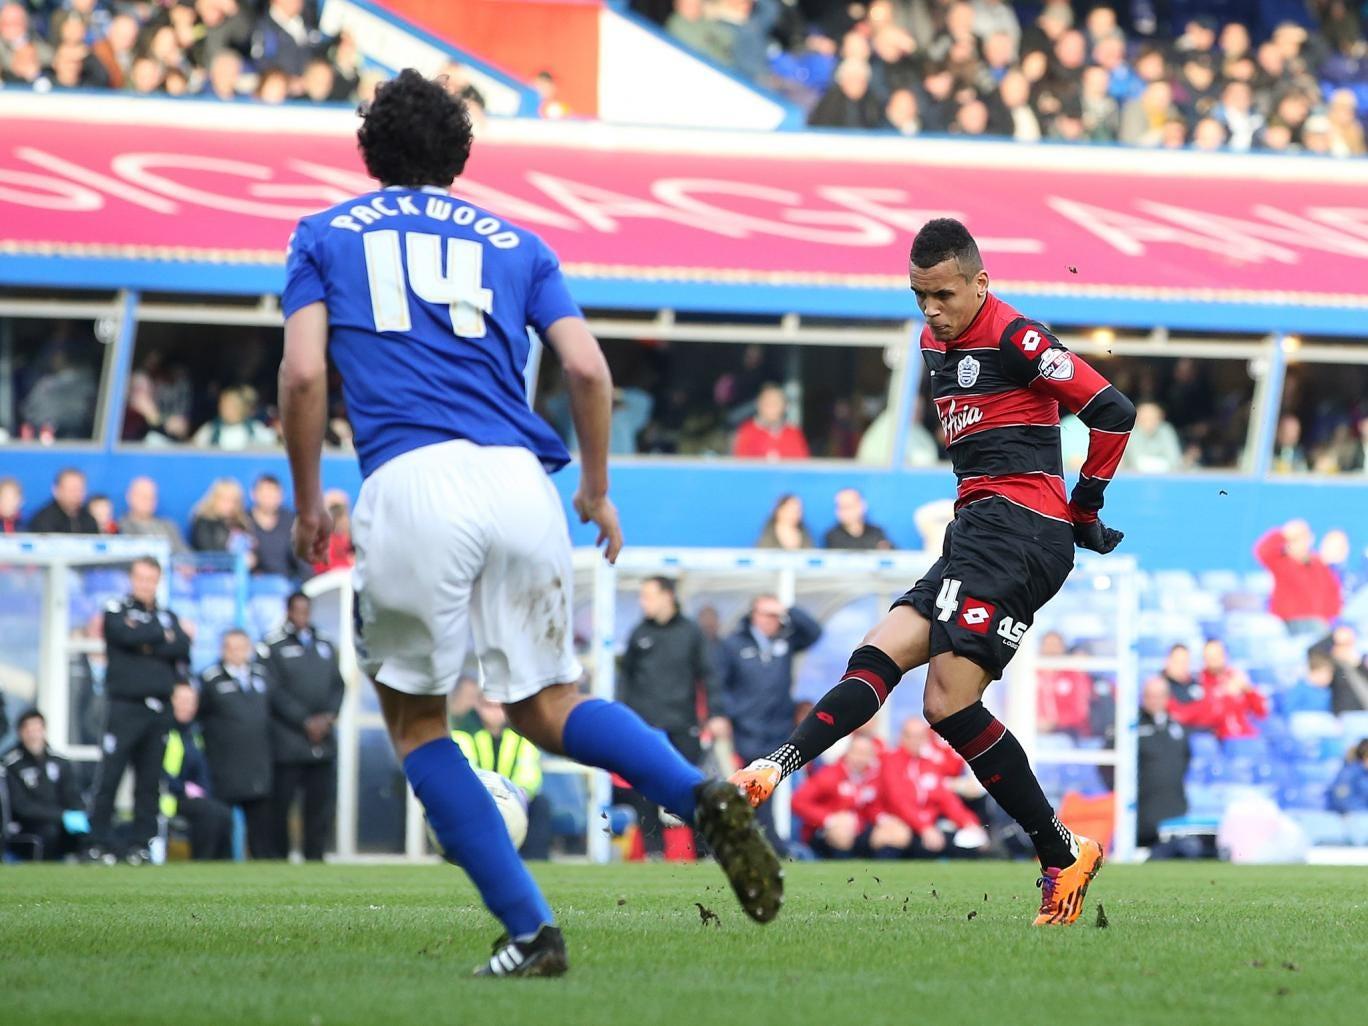 Ravel Morrison scores for QPR in their 2-0 win over Birmingham